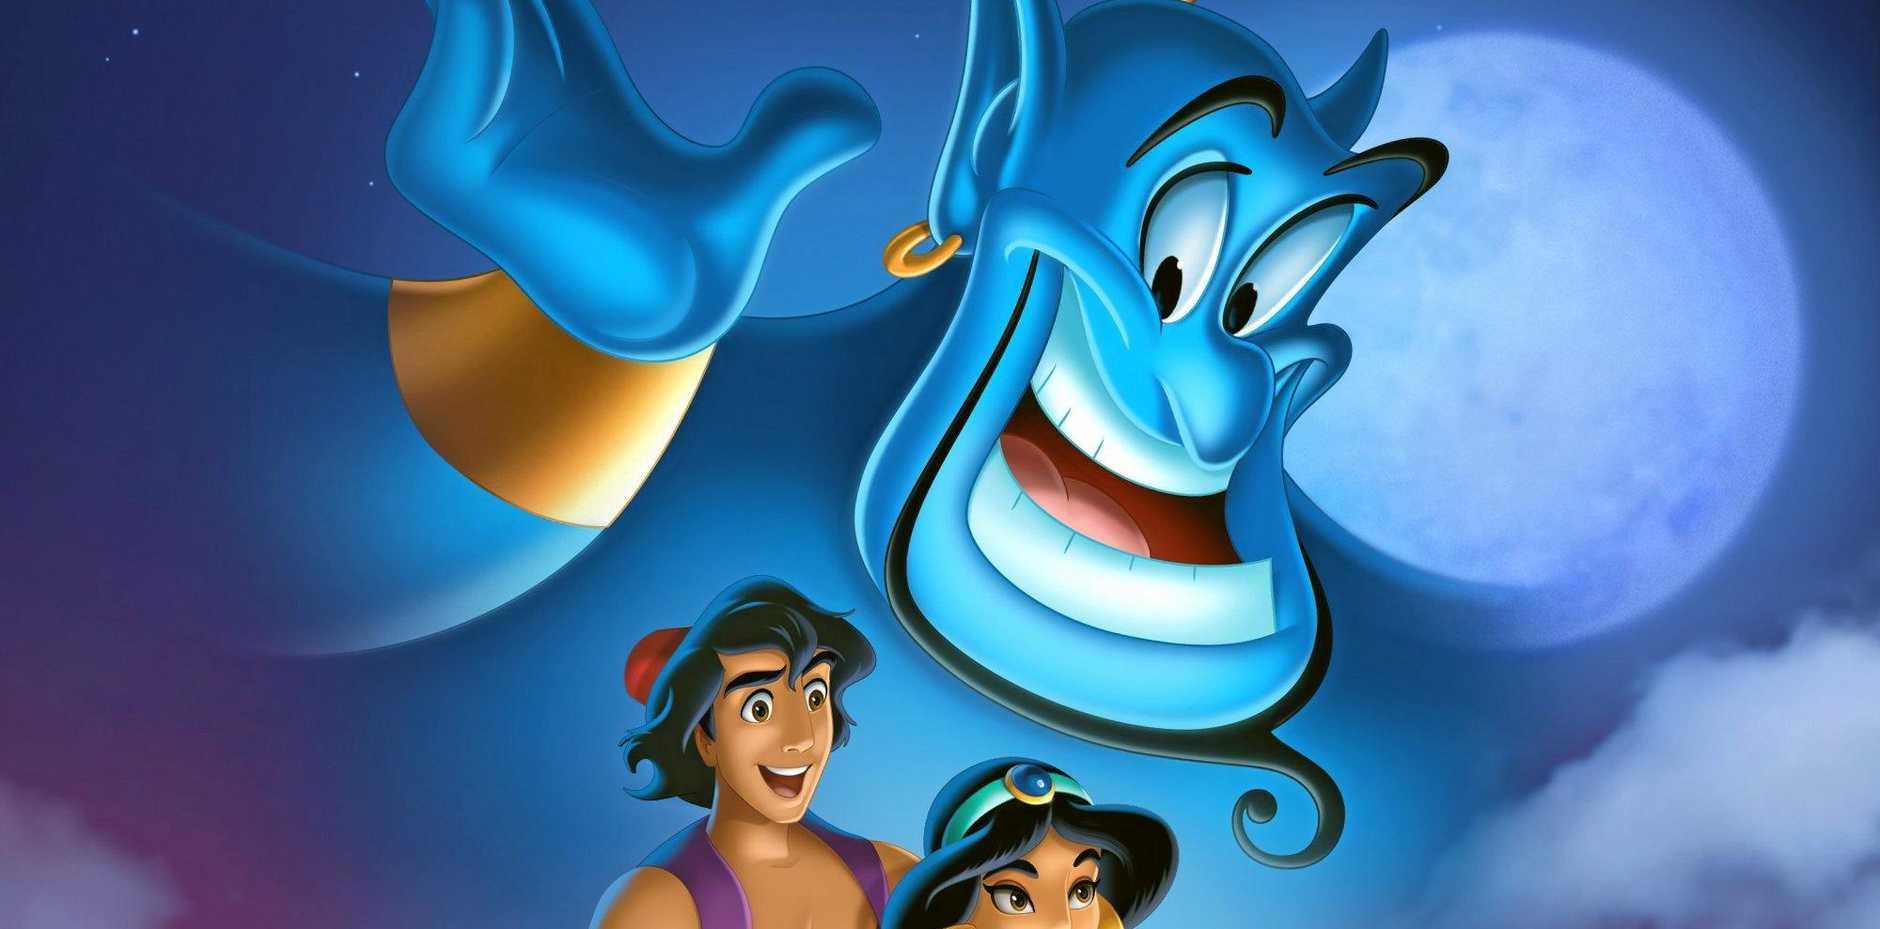 Disney reveals cast for live action remake of Aladdin